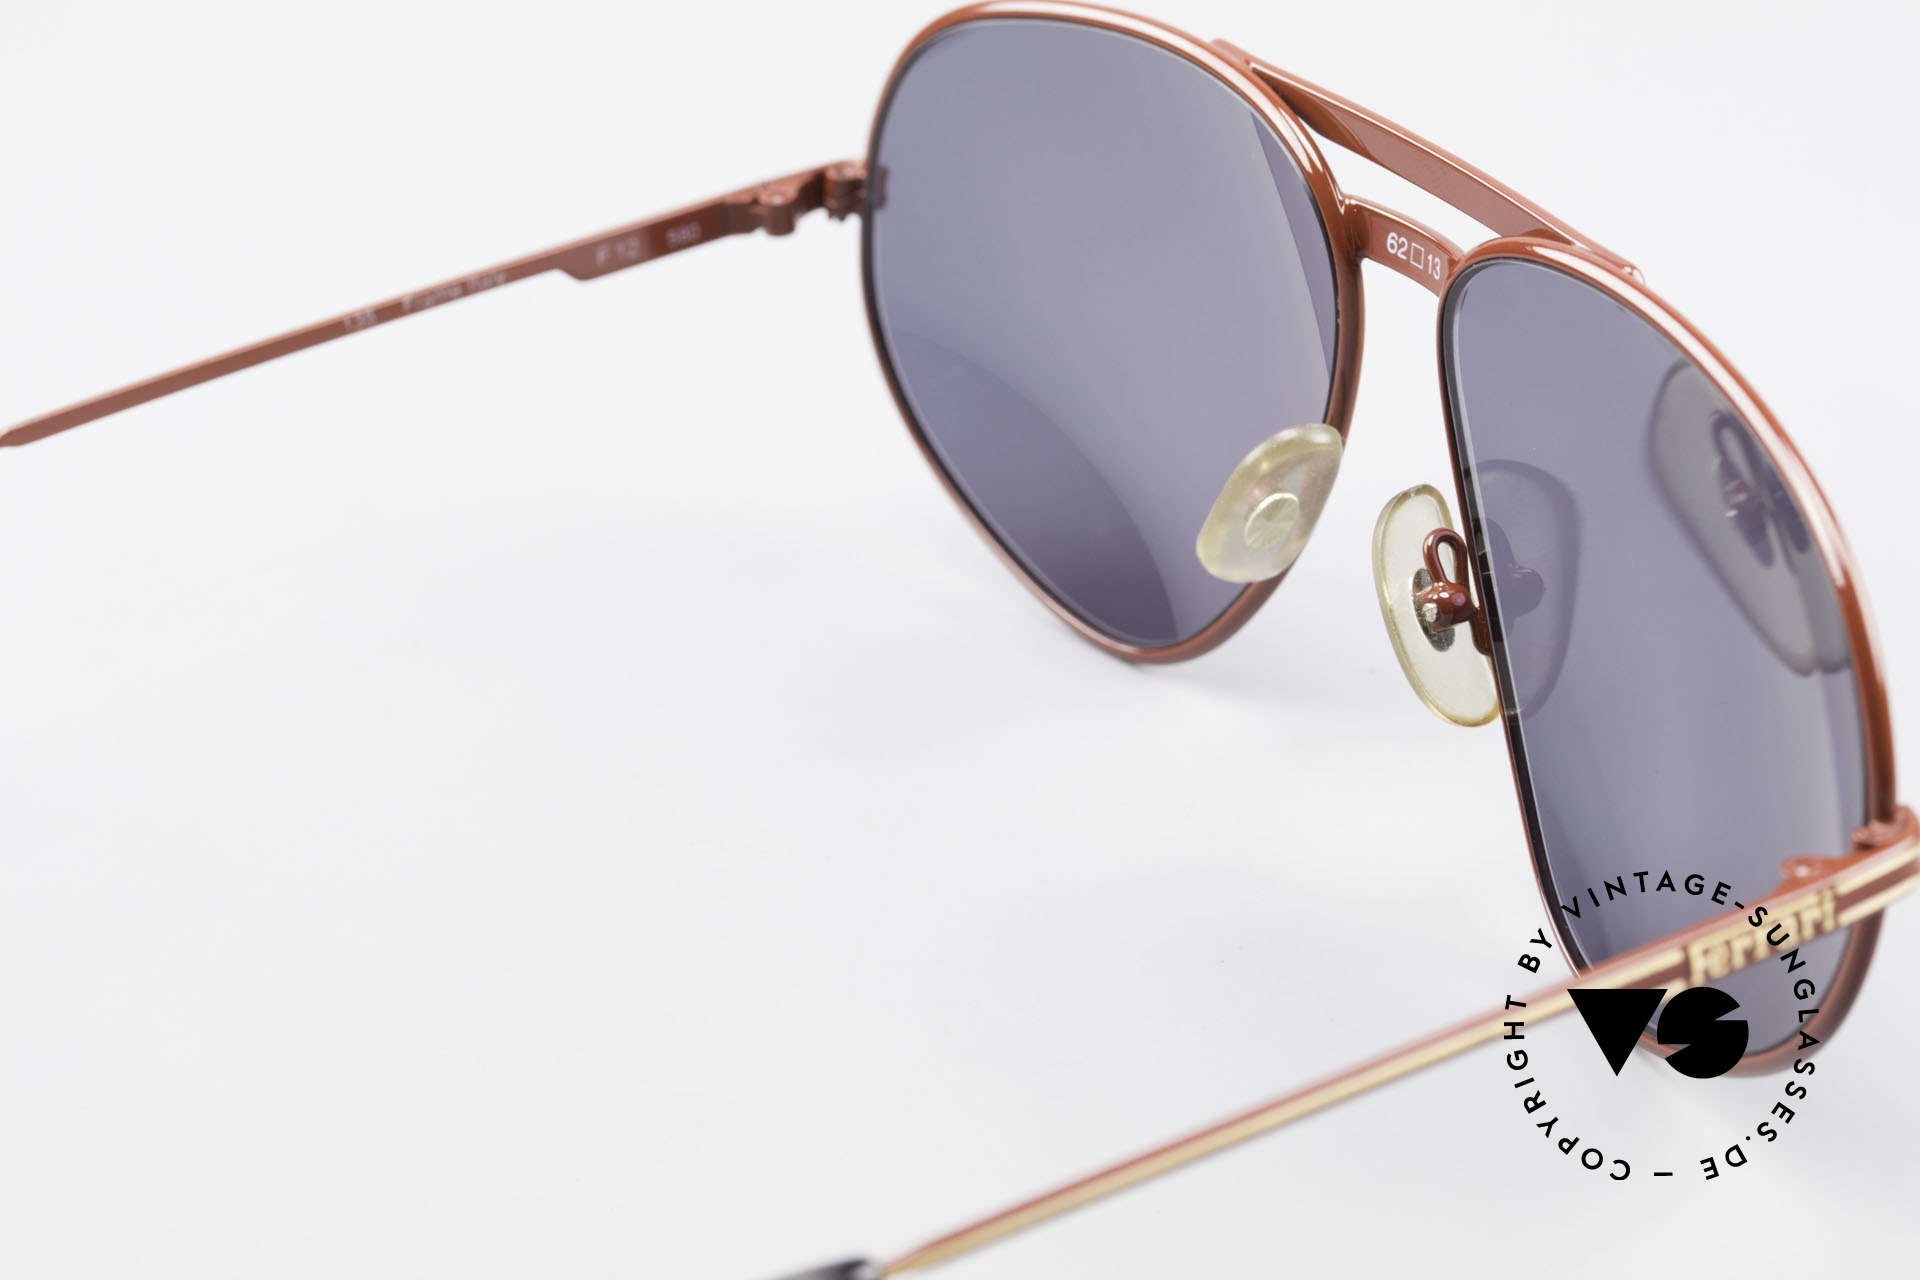 Ferrari F12 Old Vintage Luxury Sunglasses, NO RETRO sunglasses, but a 30 years old ORIGINAL!, Made for Men